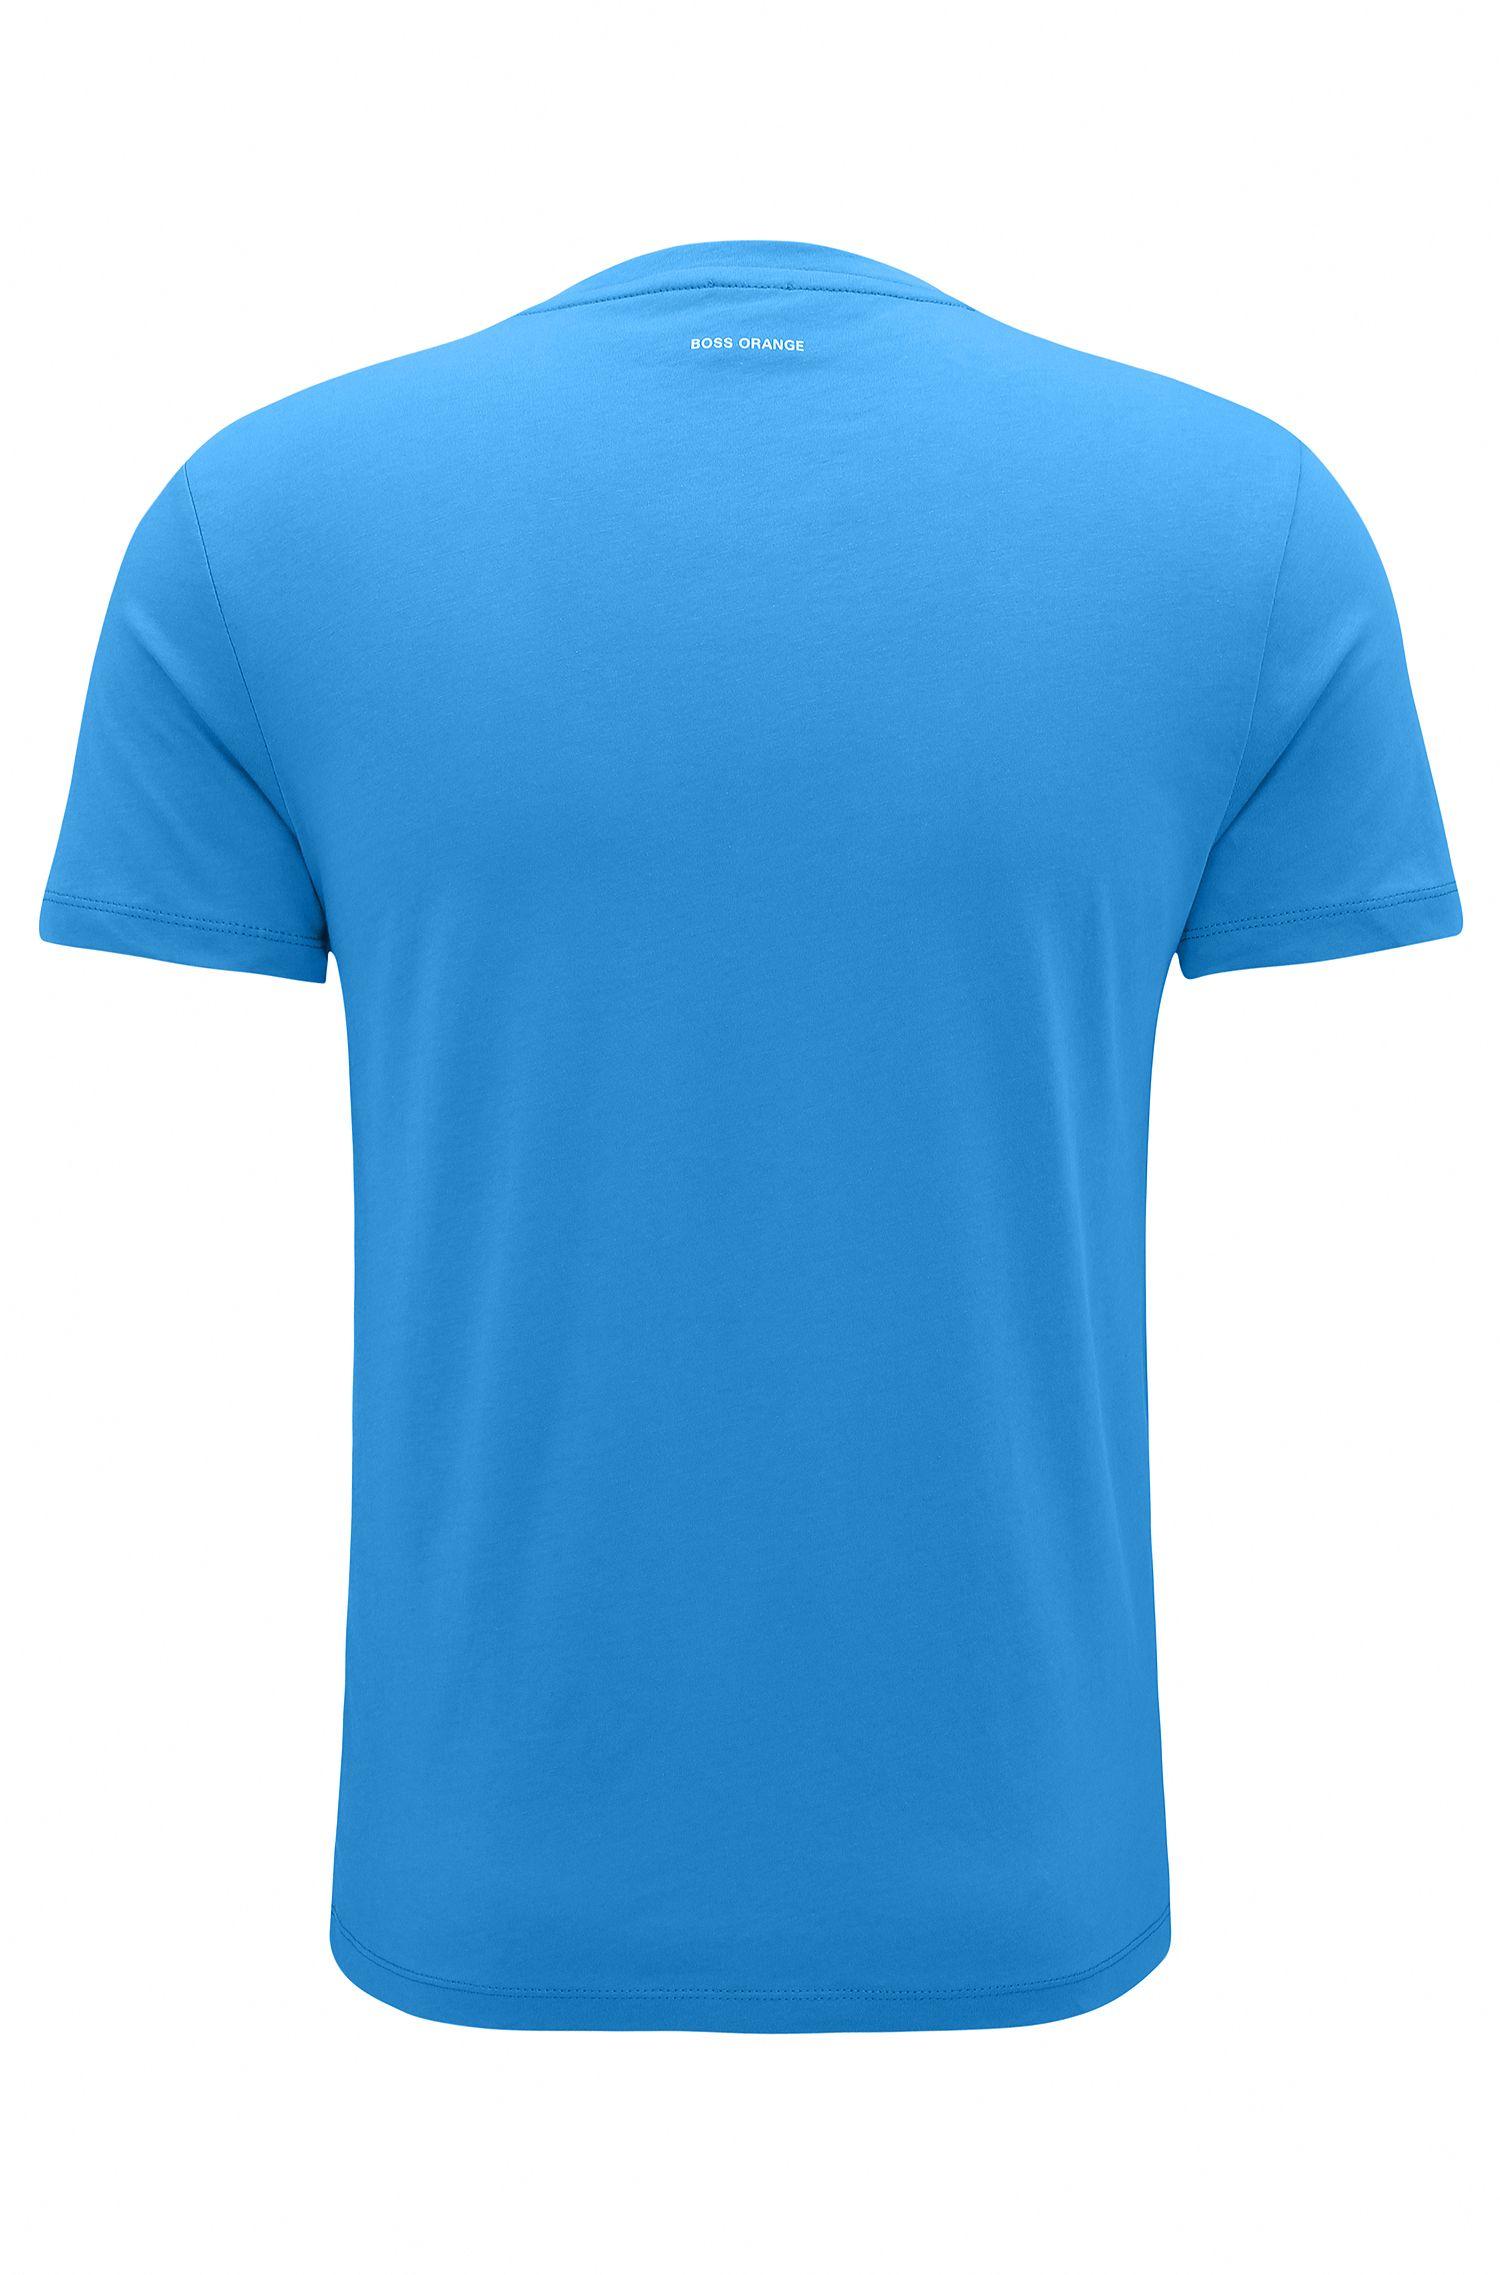 T-shirt Regular Fit en coton avec logo, Bleu